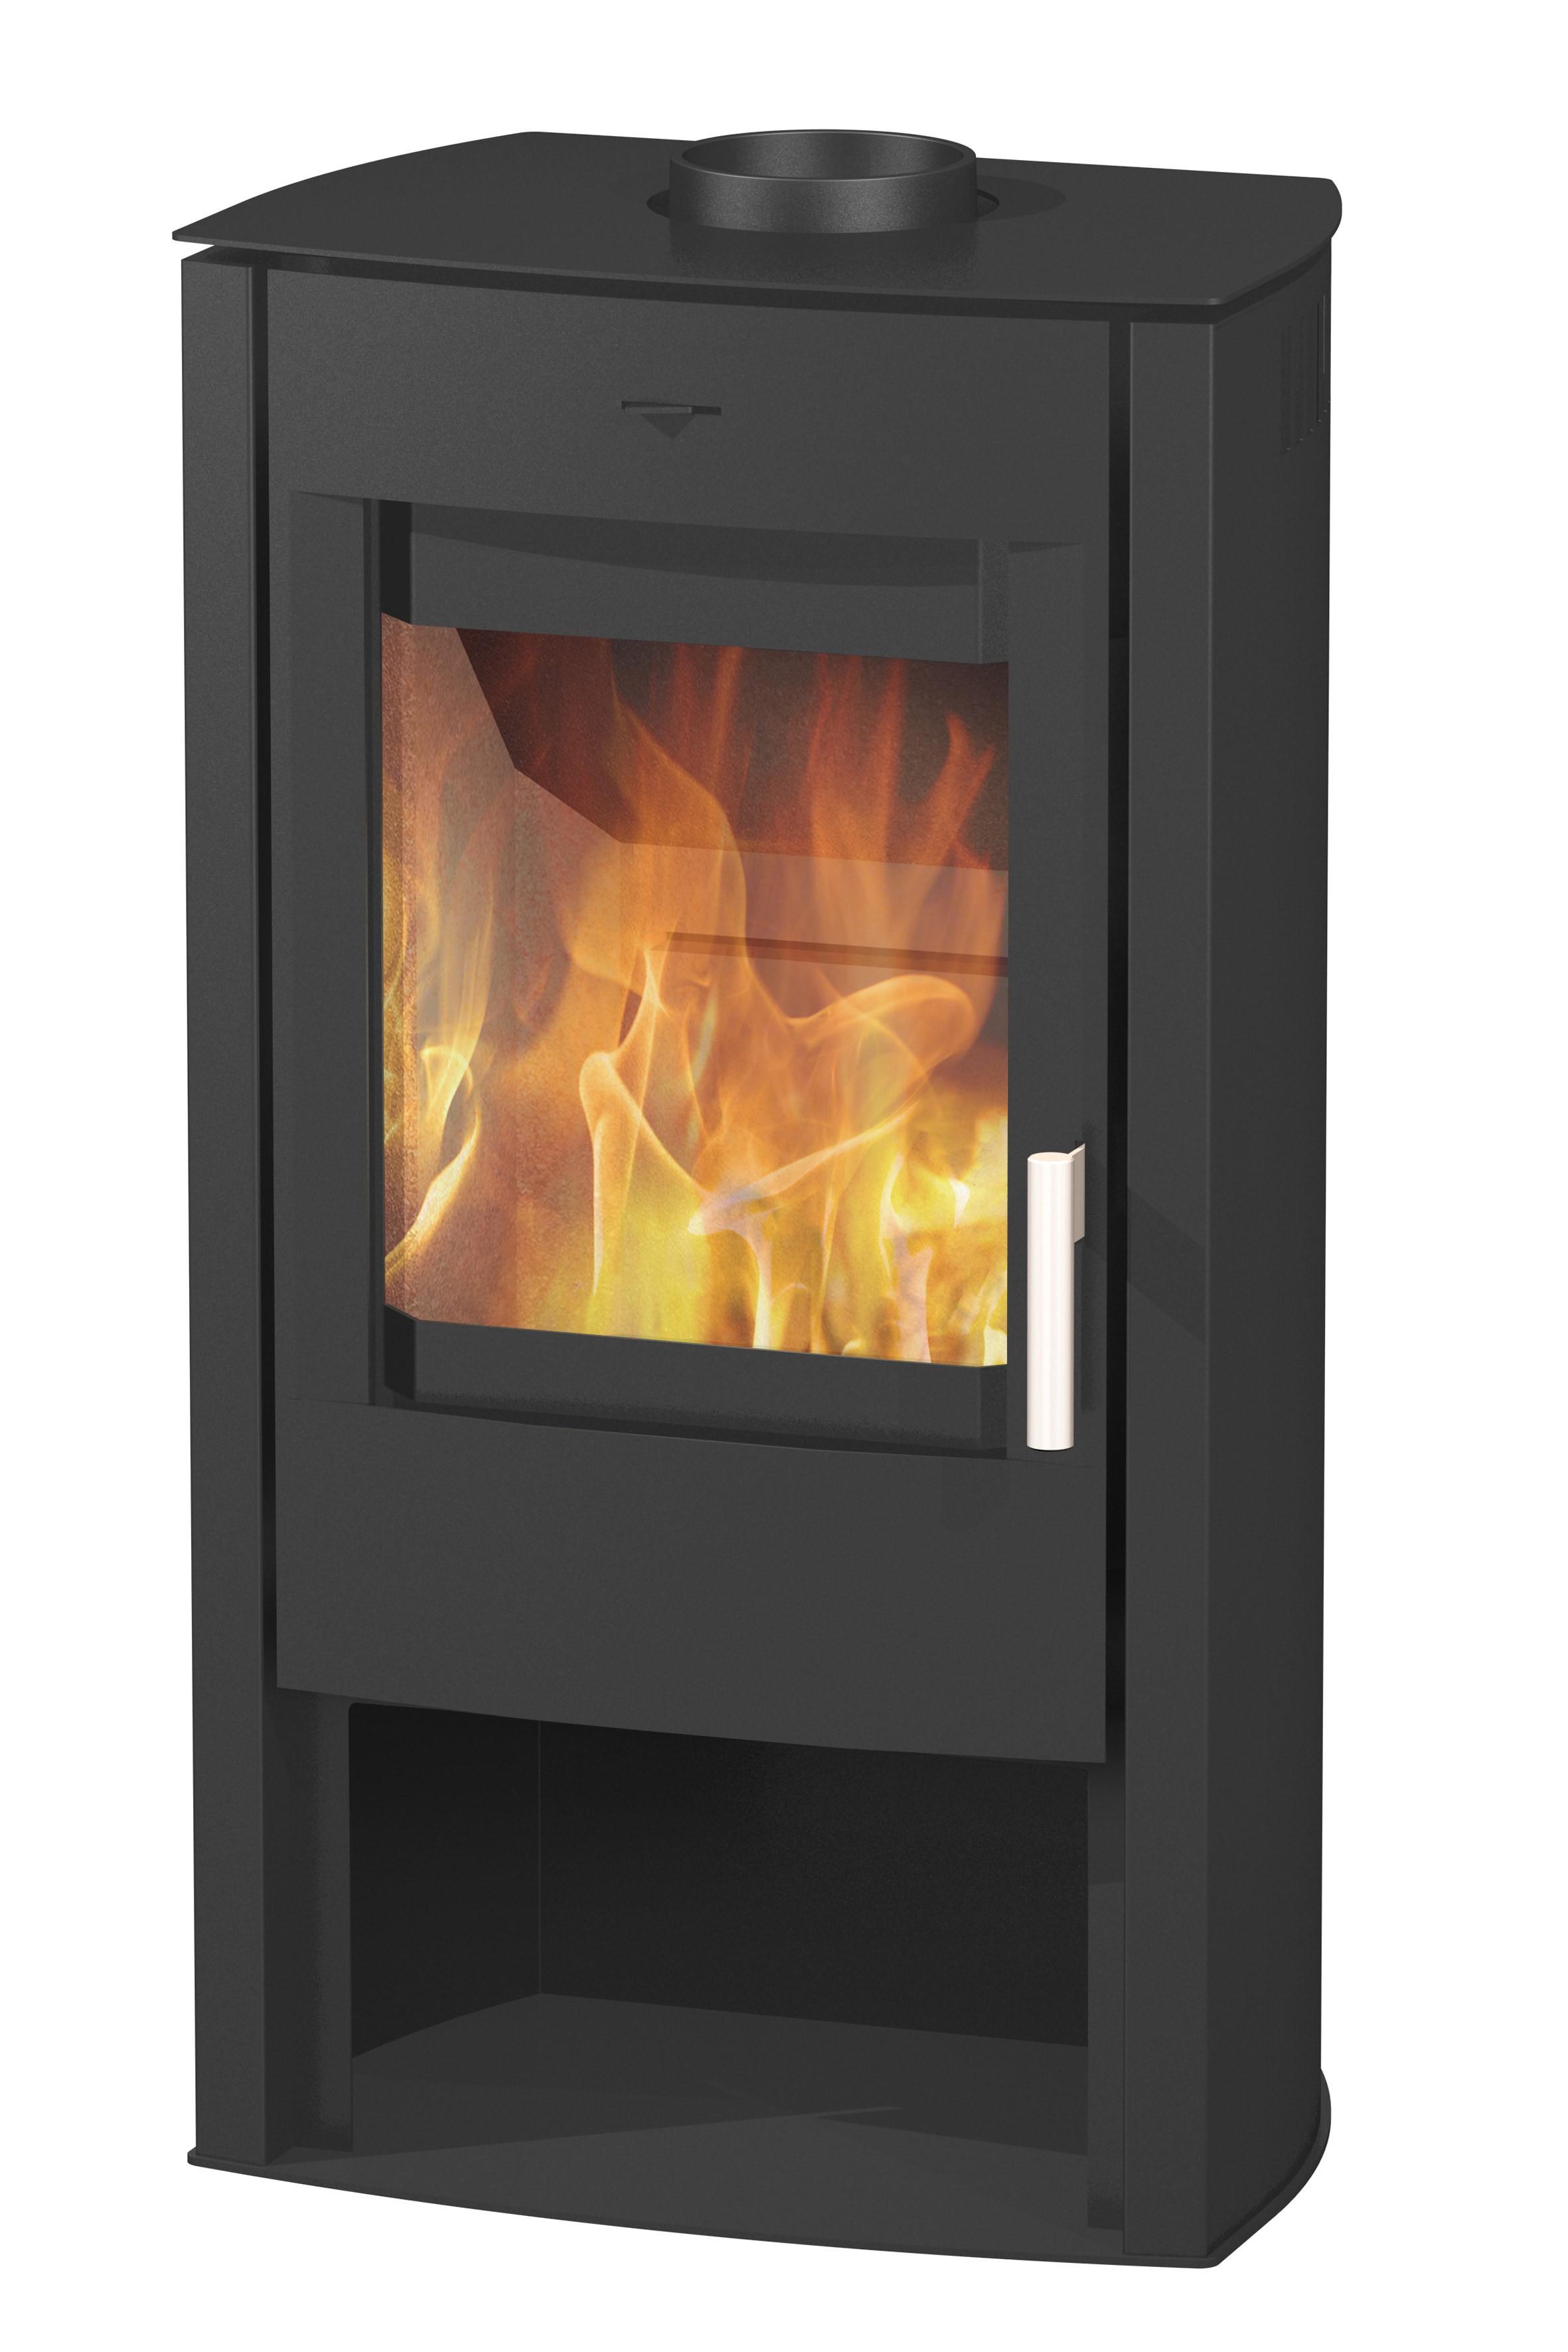 kaminofen fireplace tuvalu stahl schwarz 6kw bei. Black Bedroom Furniture Sets. Home Design Ideas